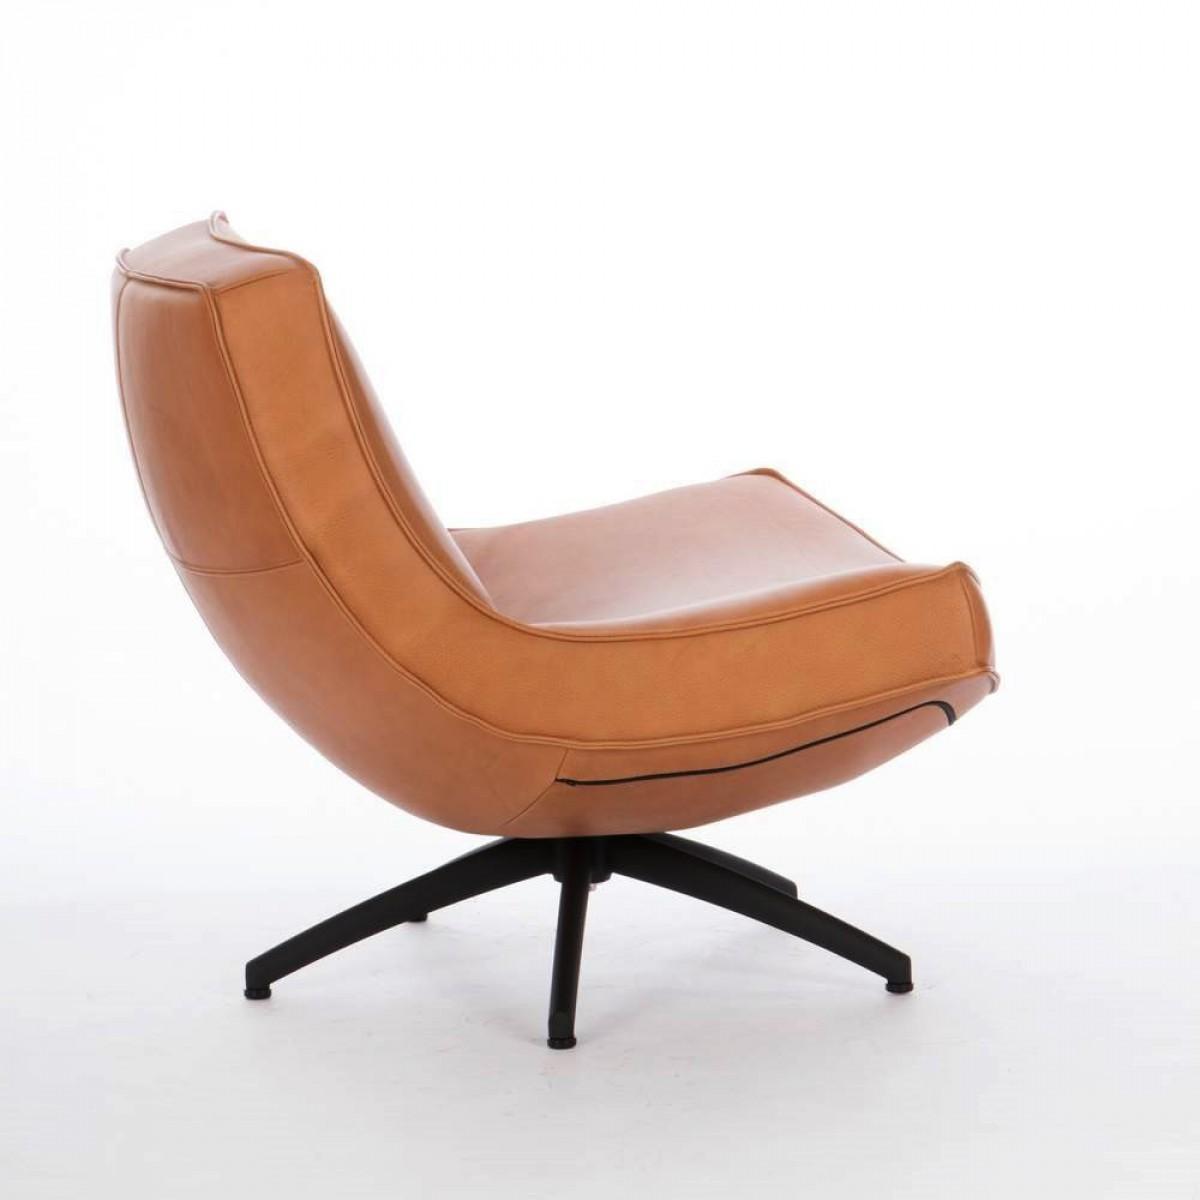 uwa-draaifauteuil-leder-he-design-rancho-toledo-lux-silk-kenia